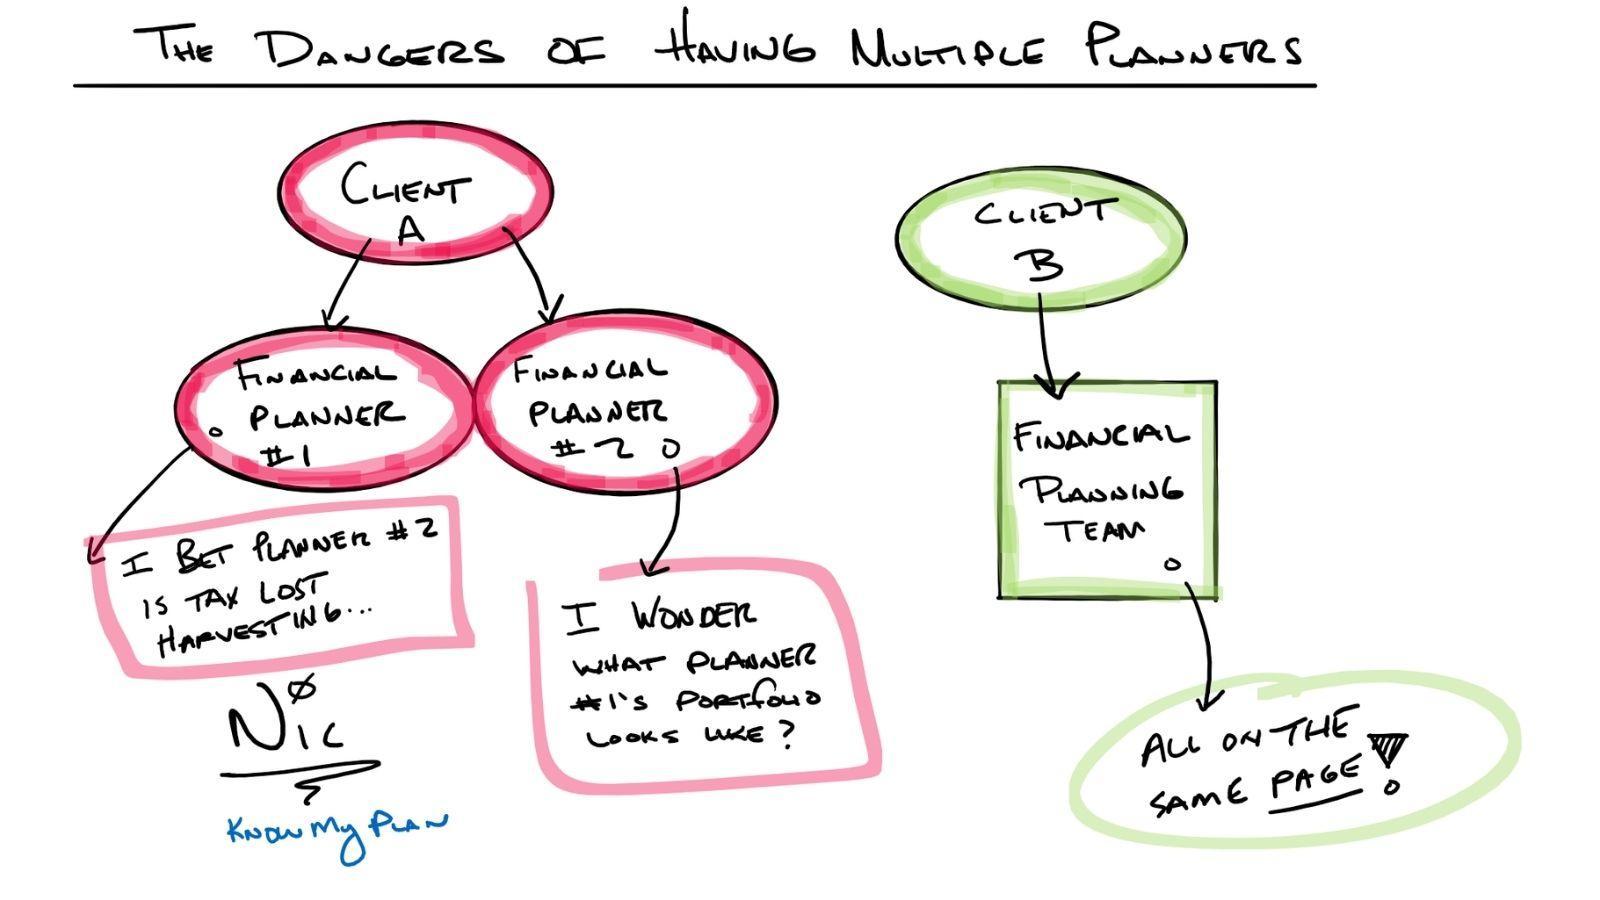 The Dangers of Having Multiple Planners Thumbnail